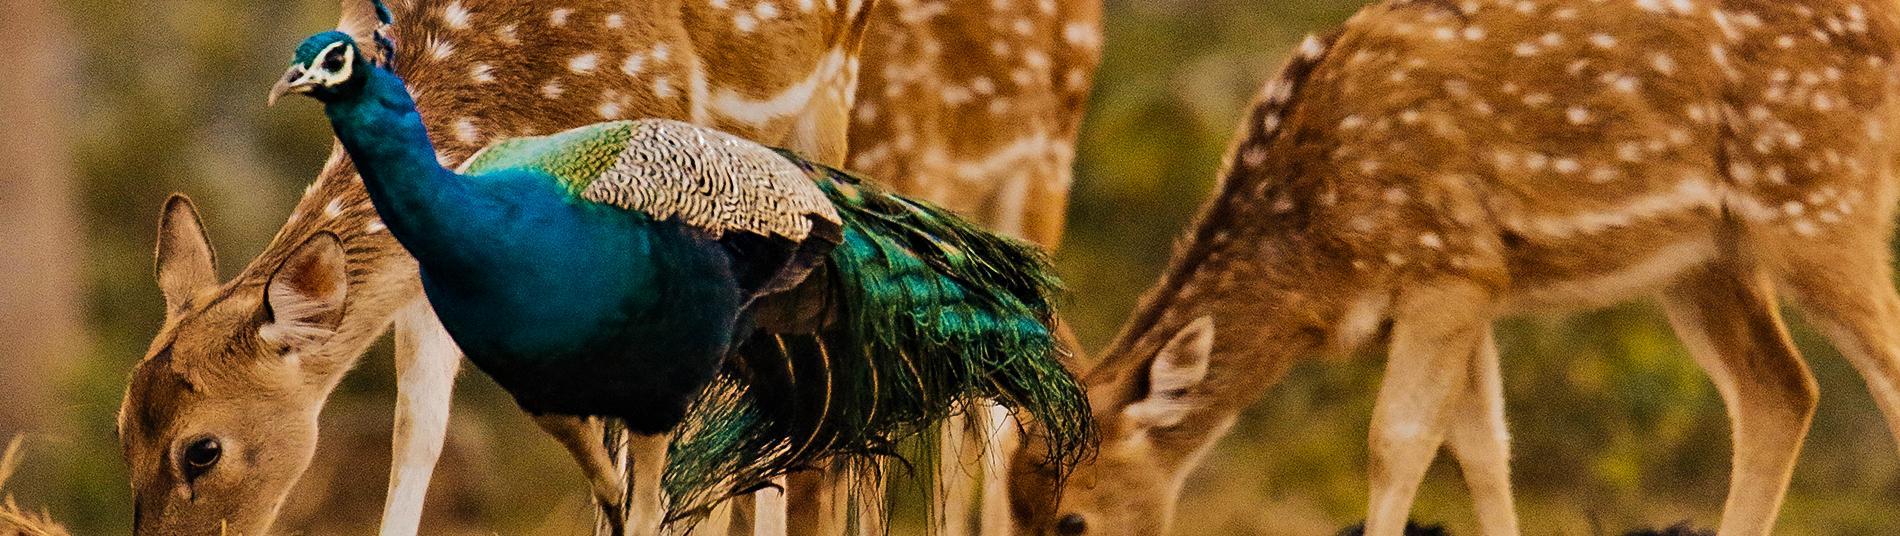 Bird Watchingr